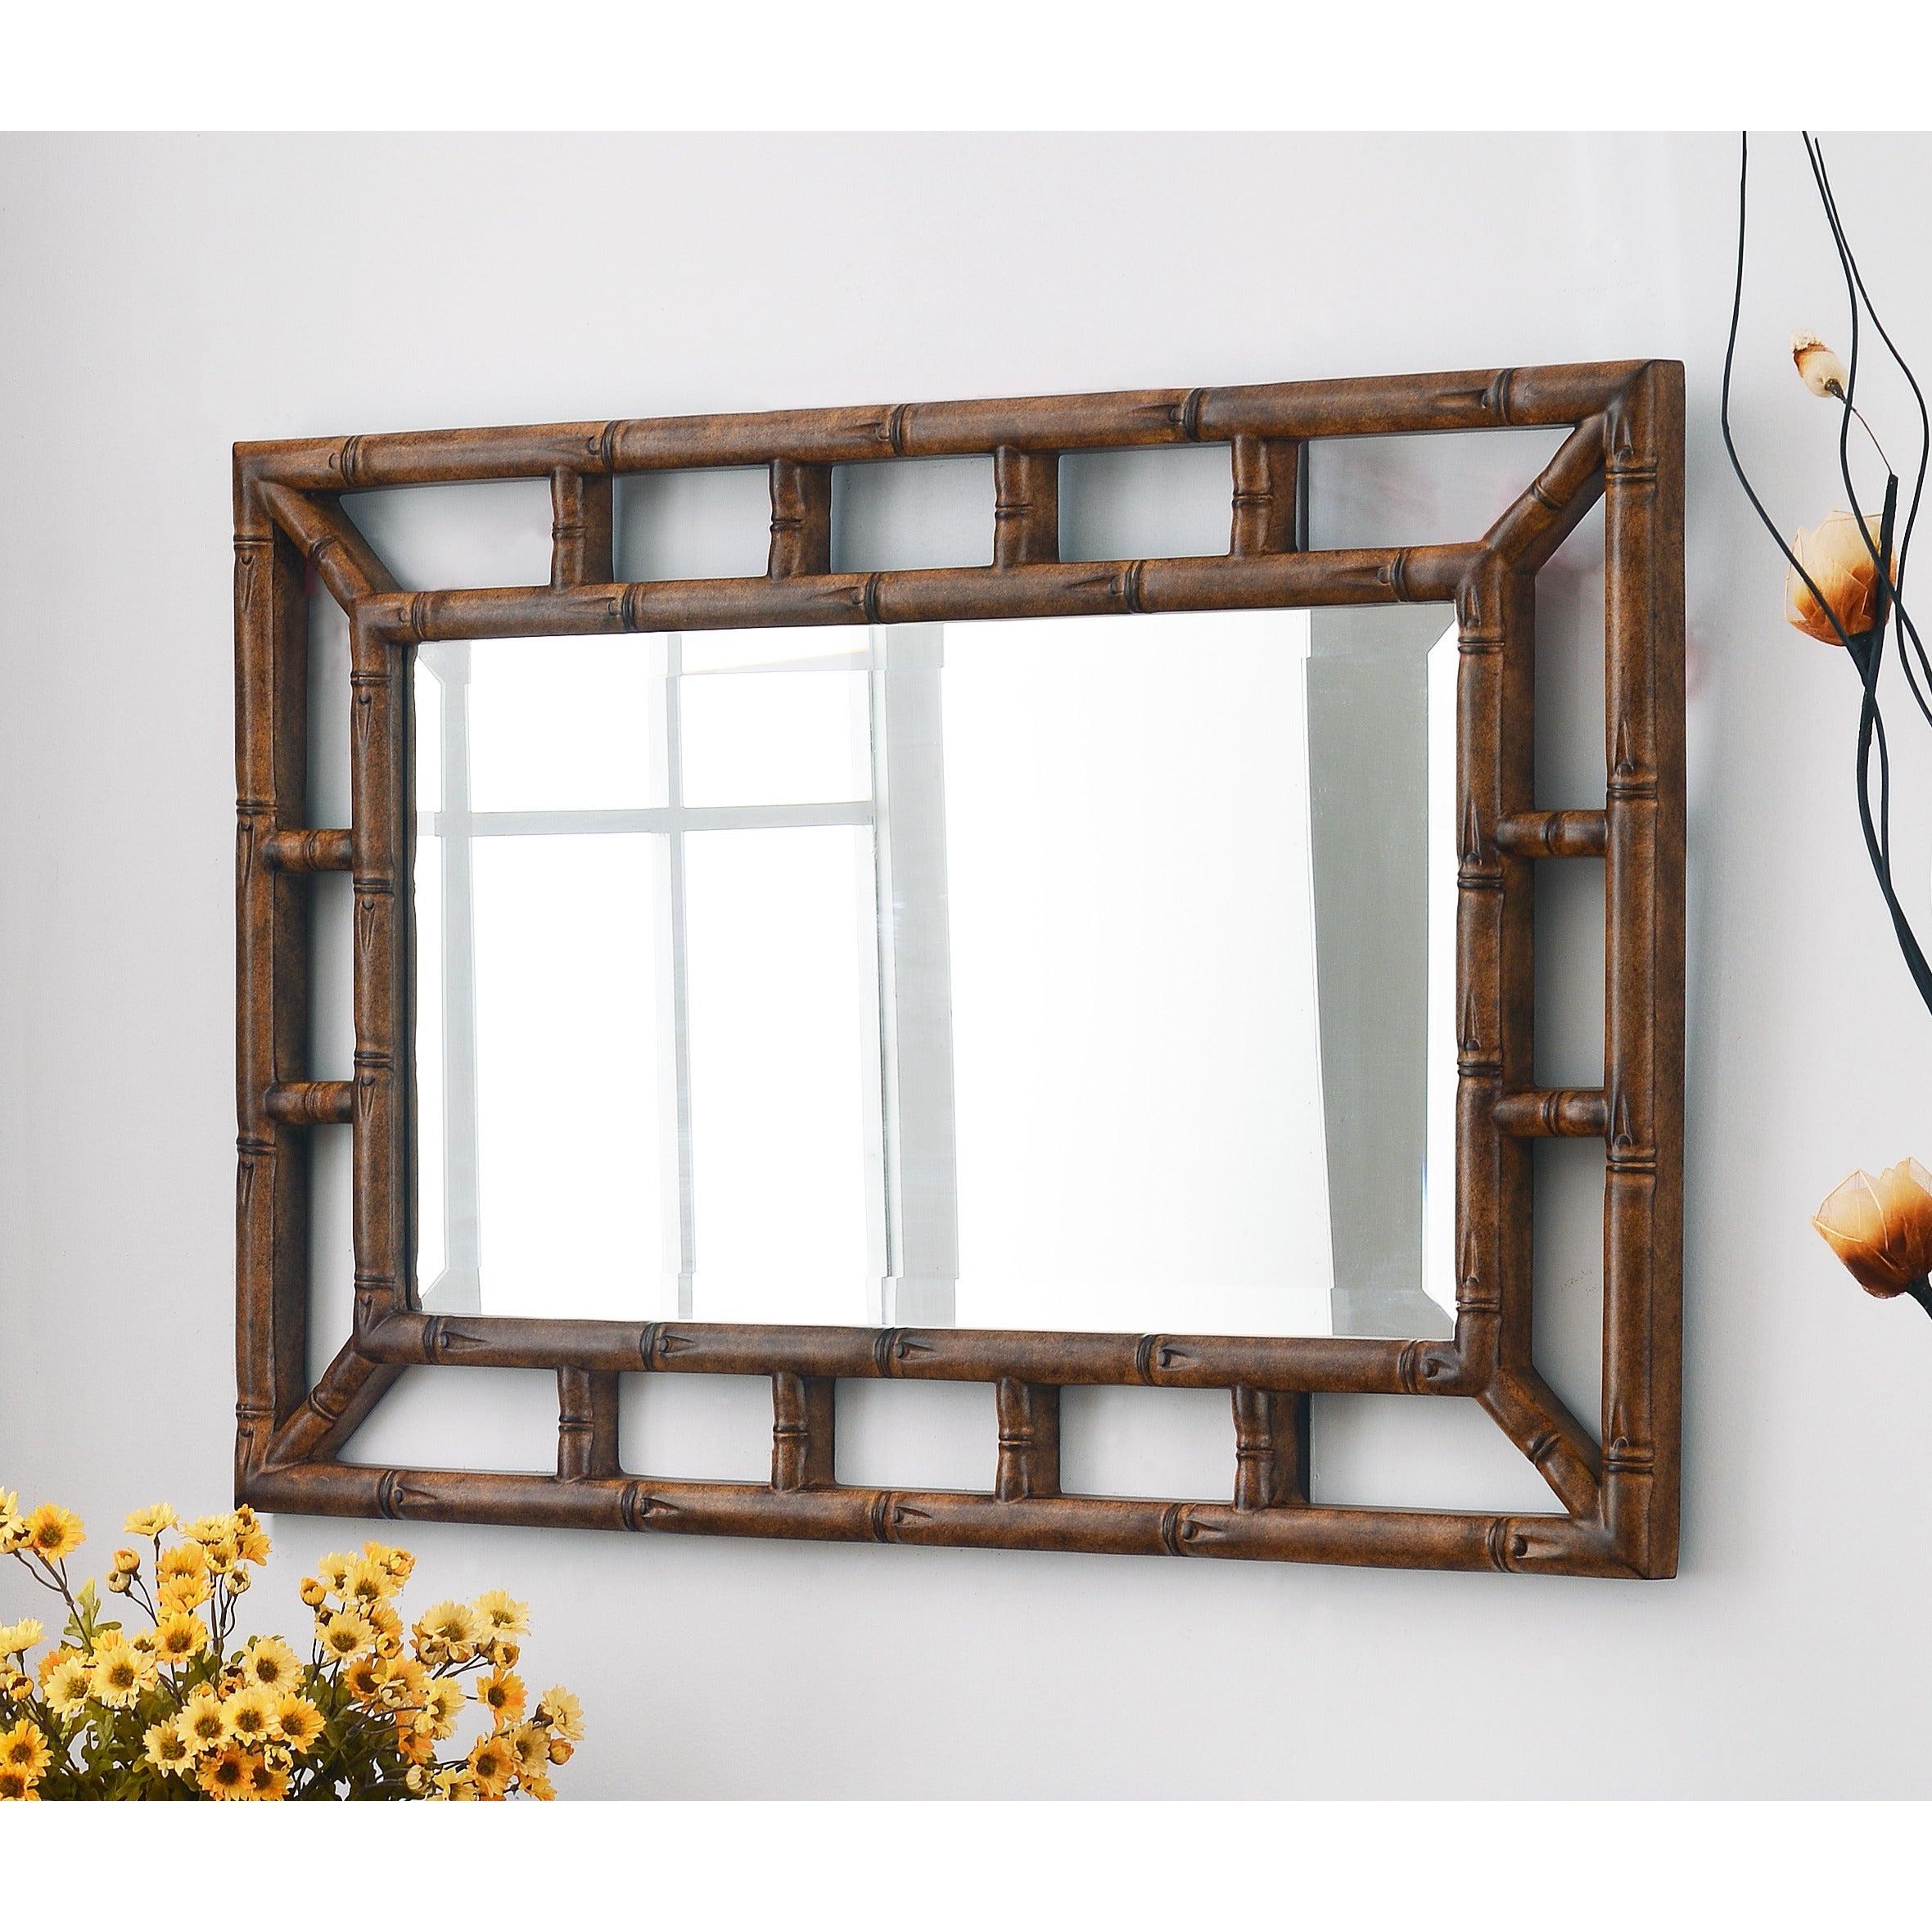 2019 Bamboo Wall Mirror Throughout Bamboo Wall Mirrors (View 3 of 20)